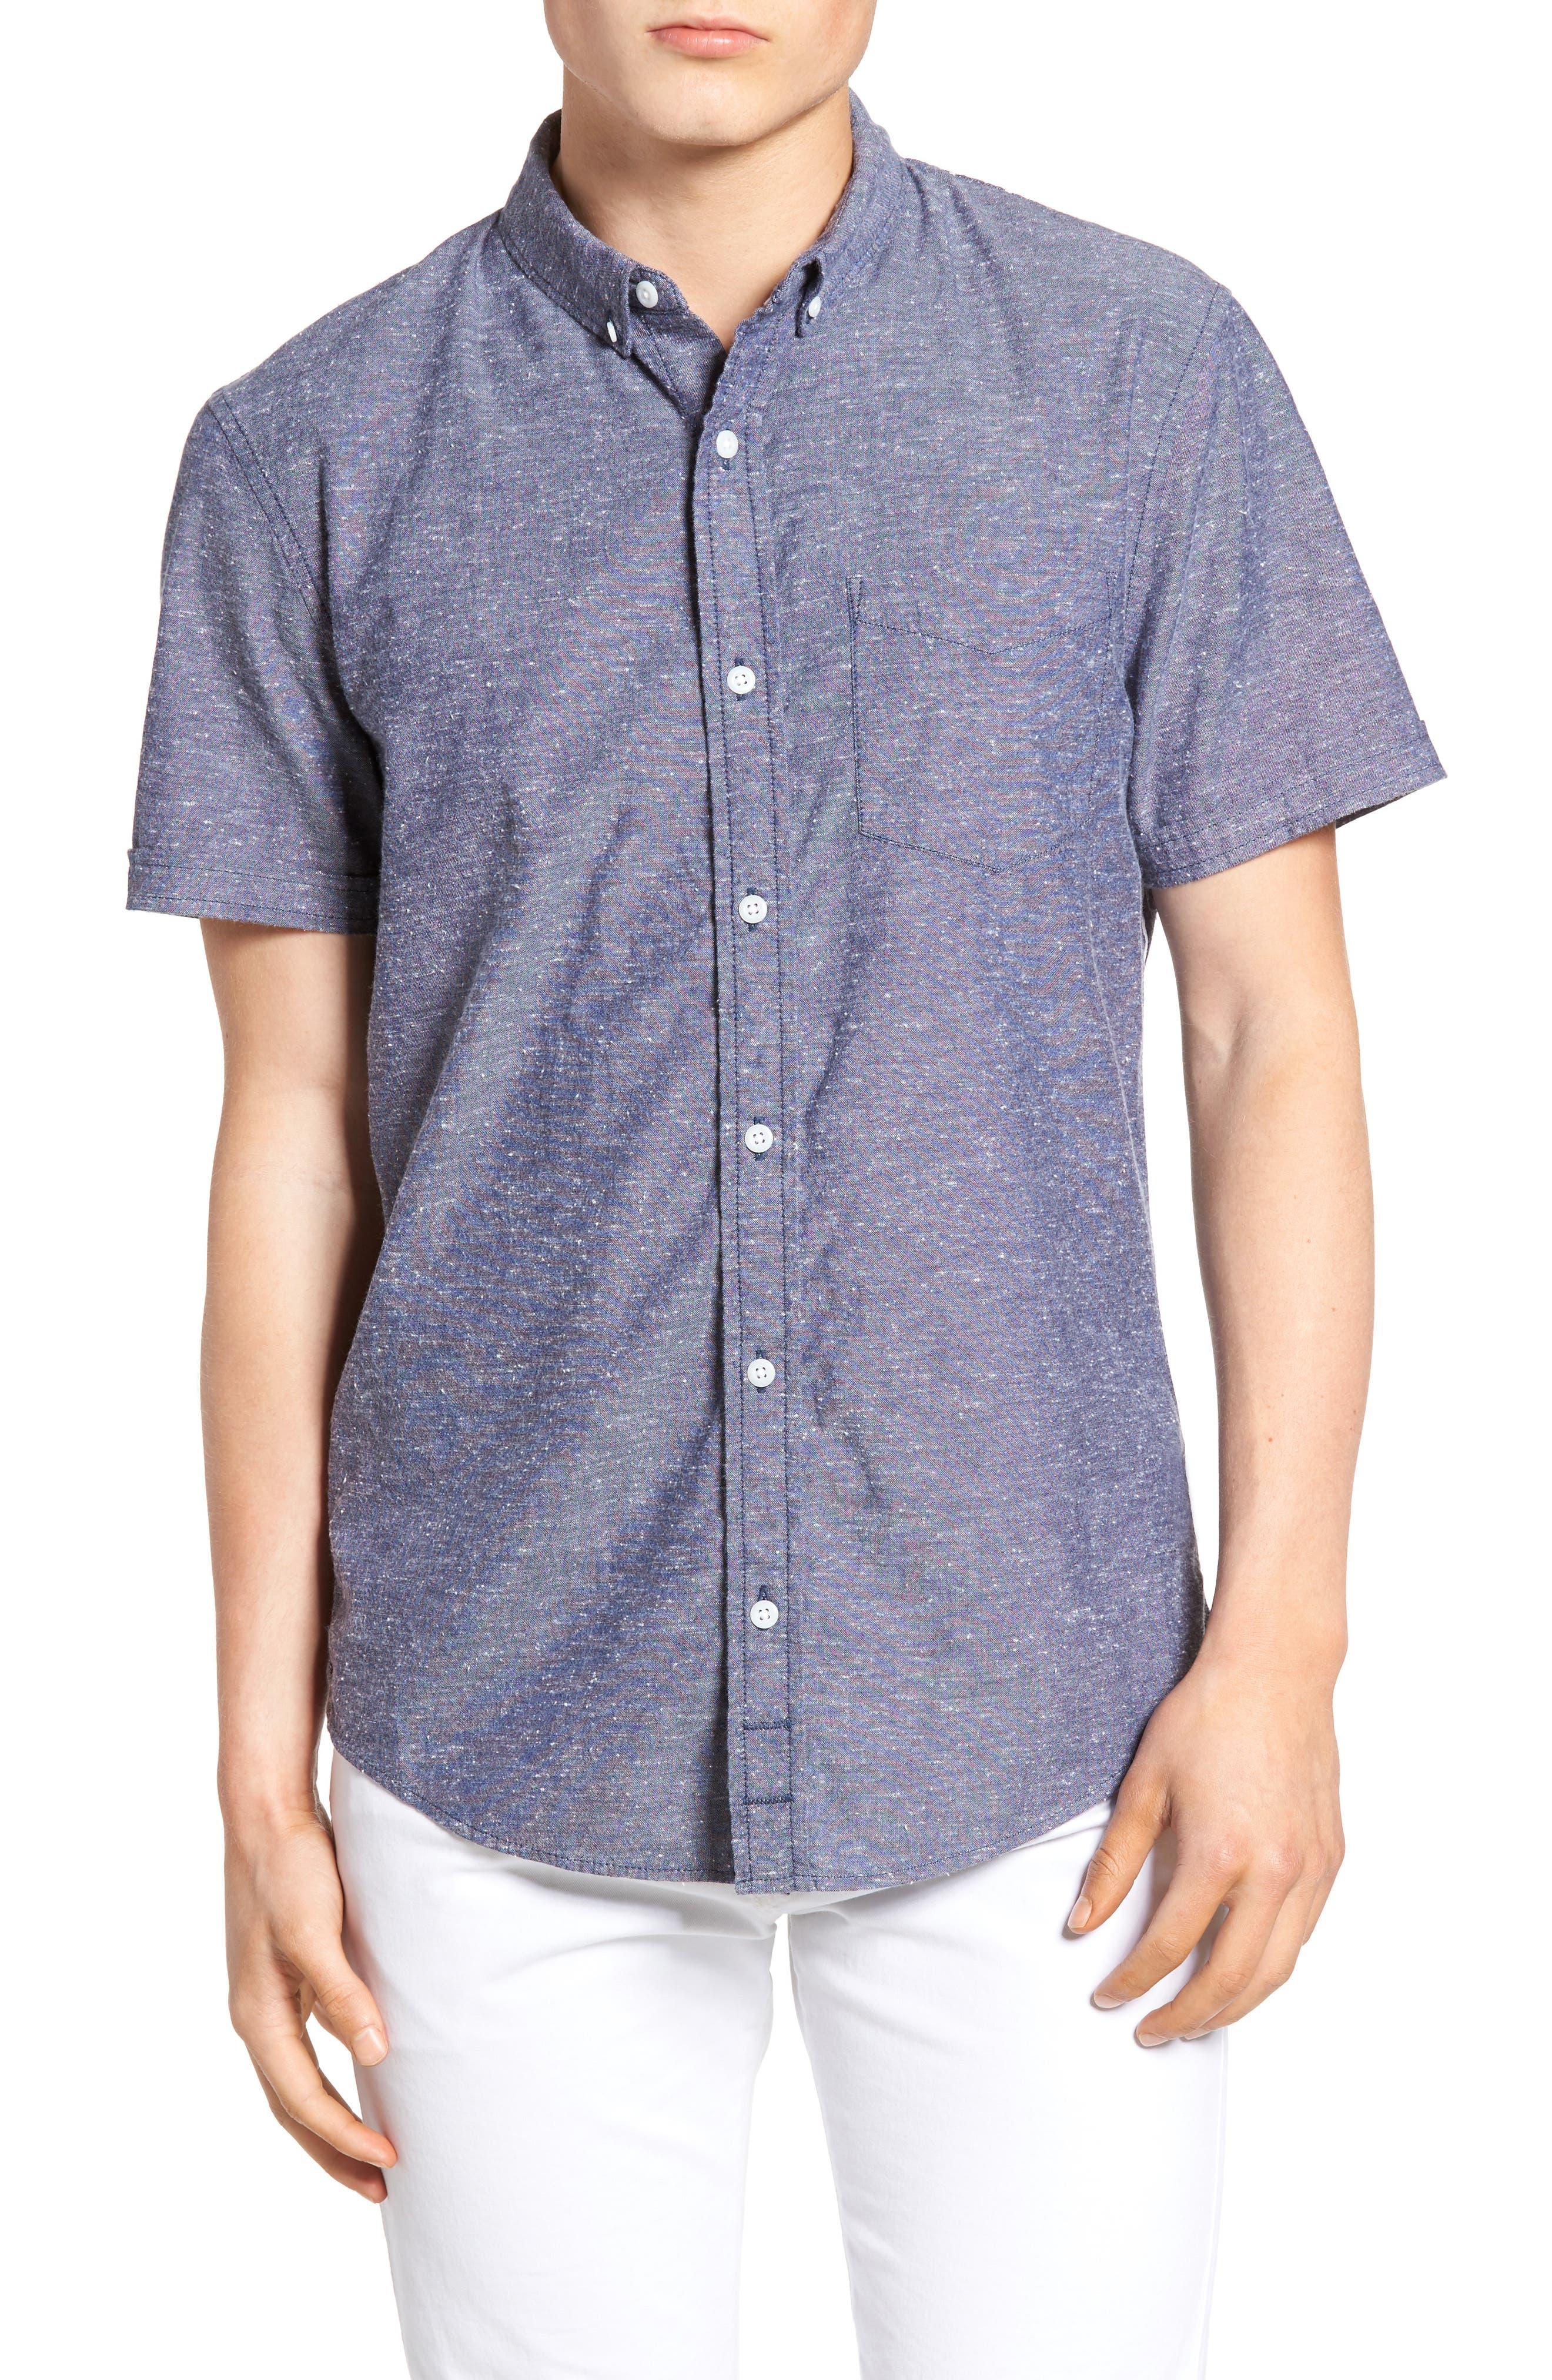 1901 Placed Stripe Chambray Shirt